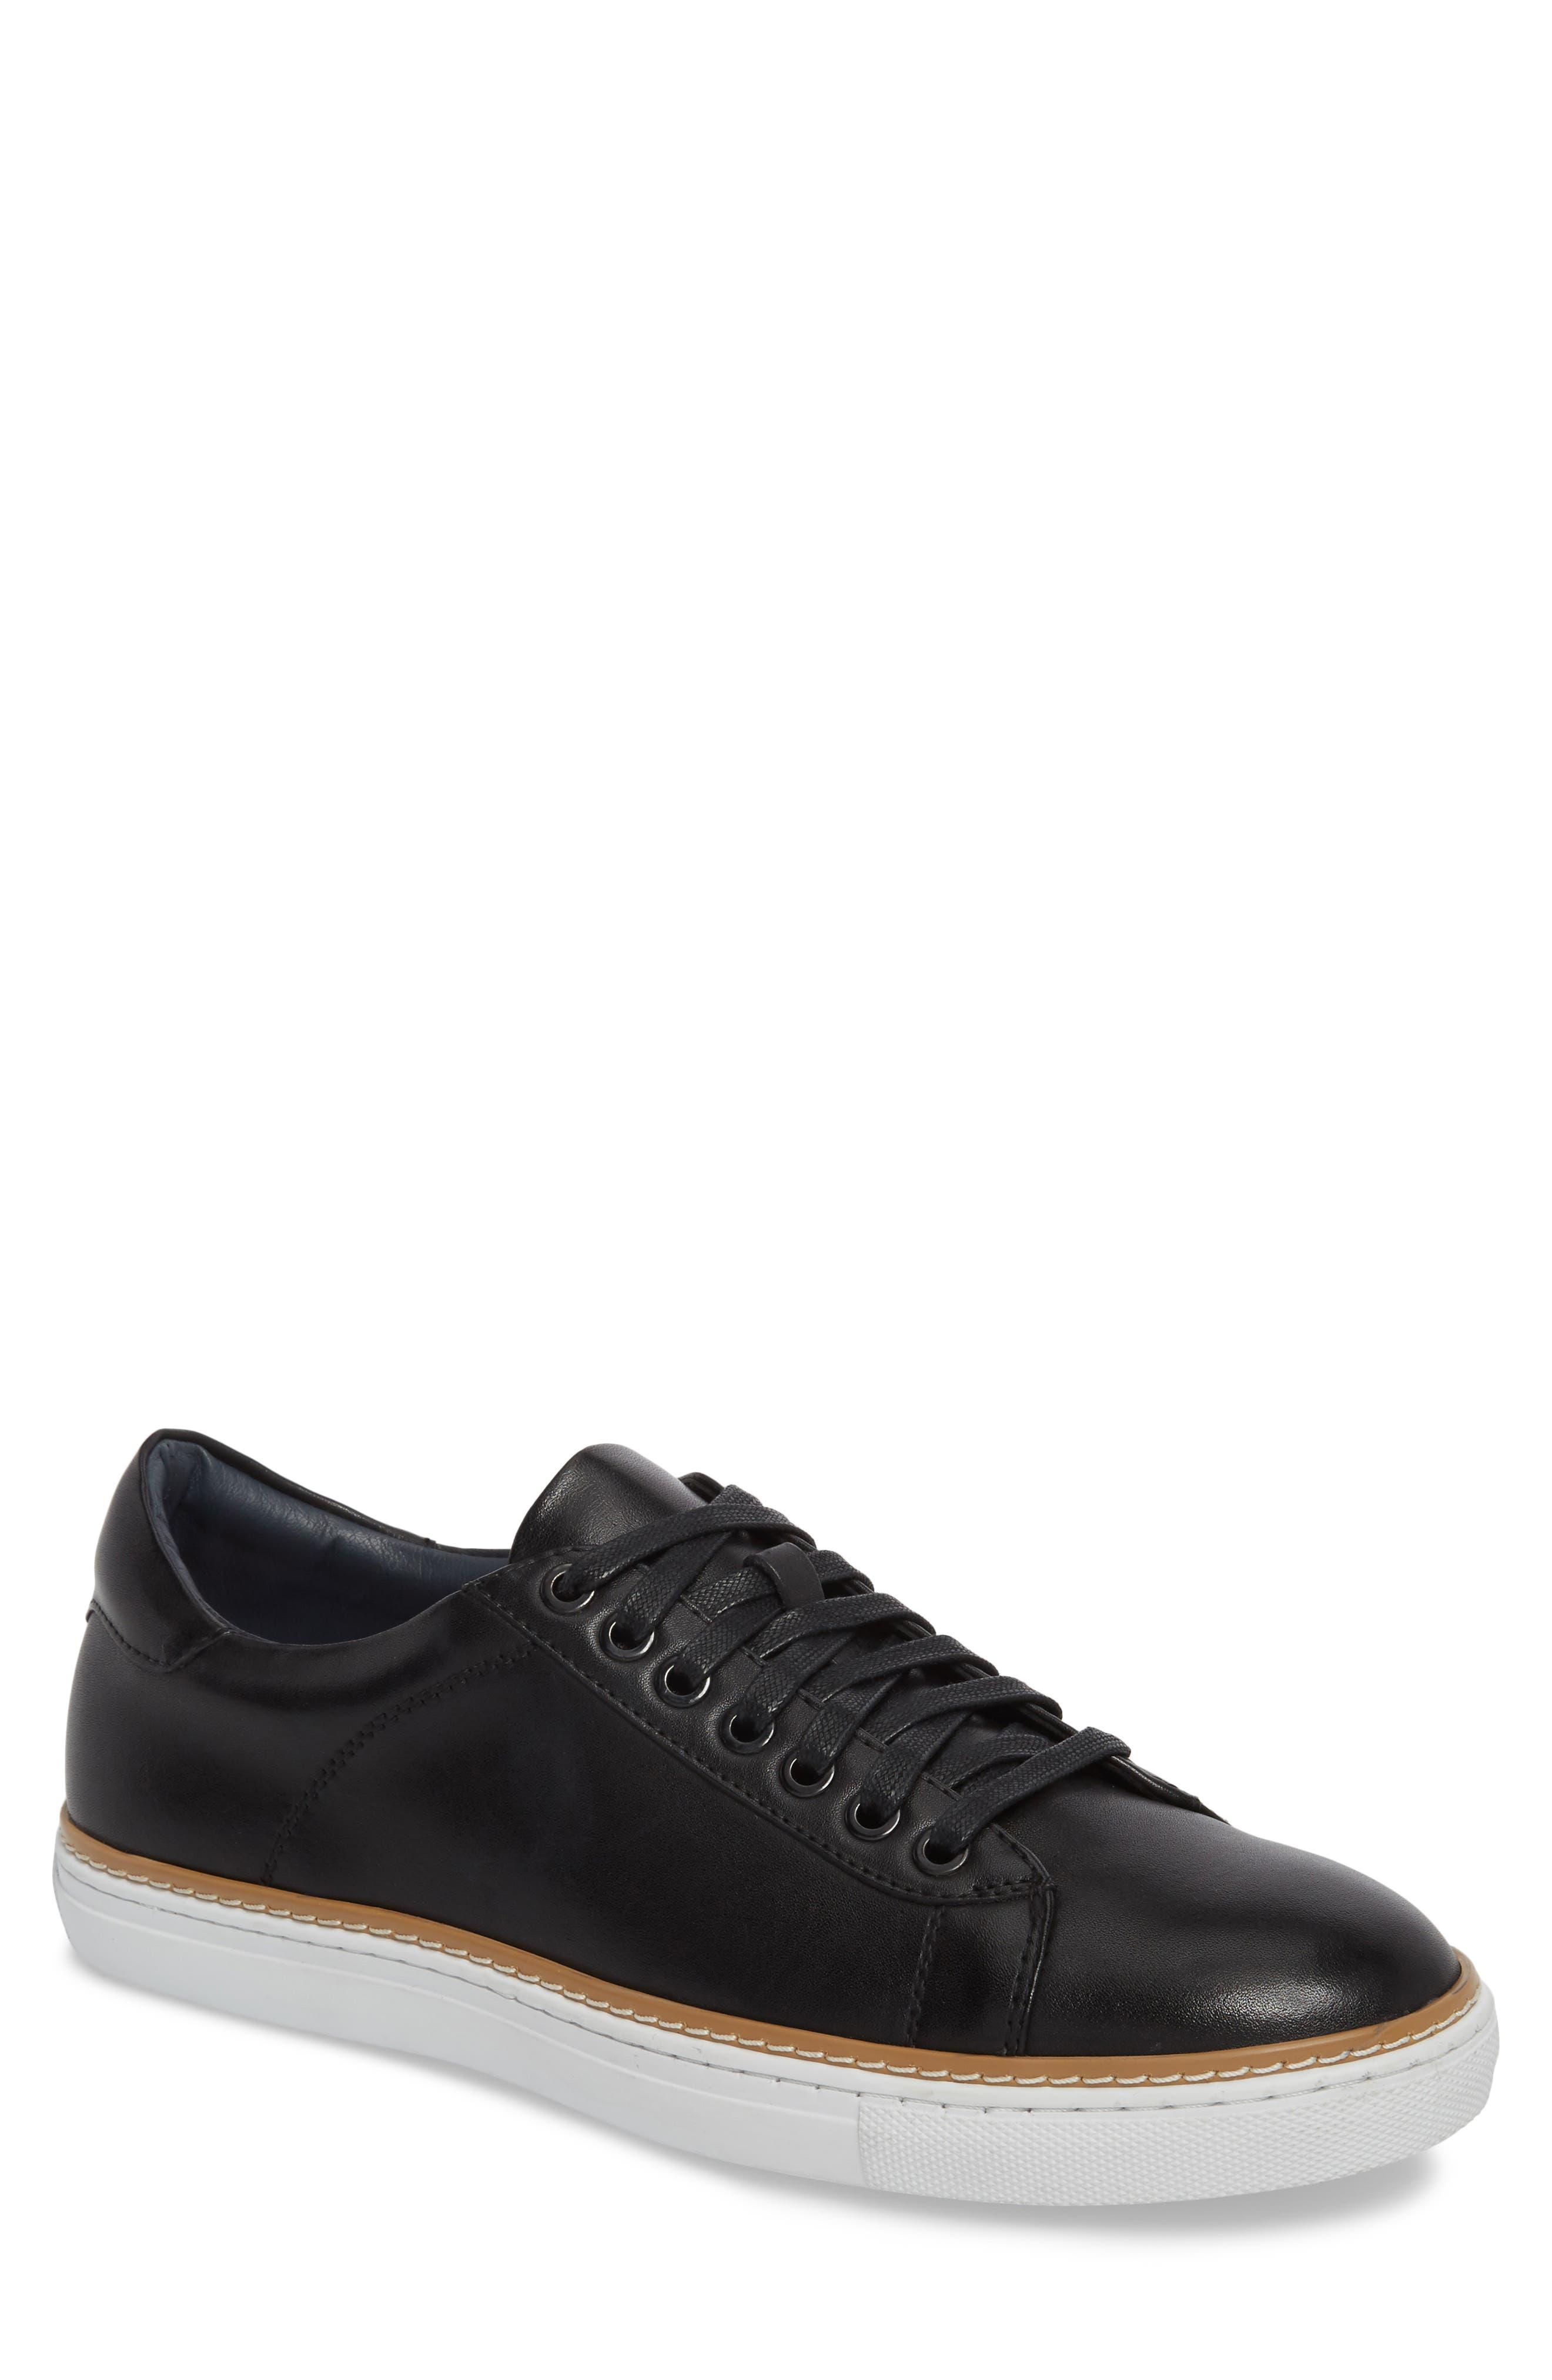 English Laundry Juniper Low Top Sneaker (Men)